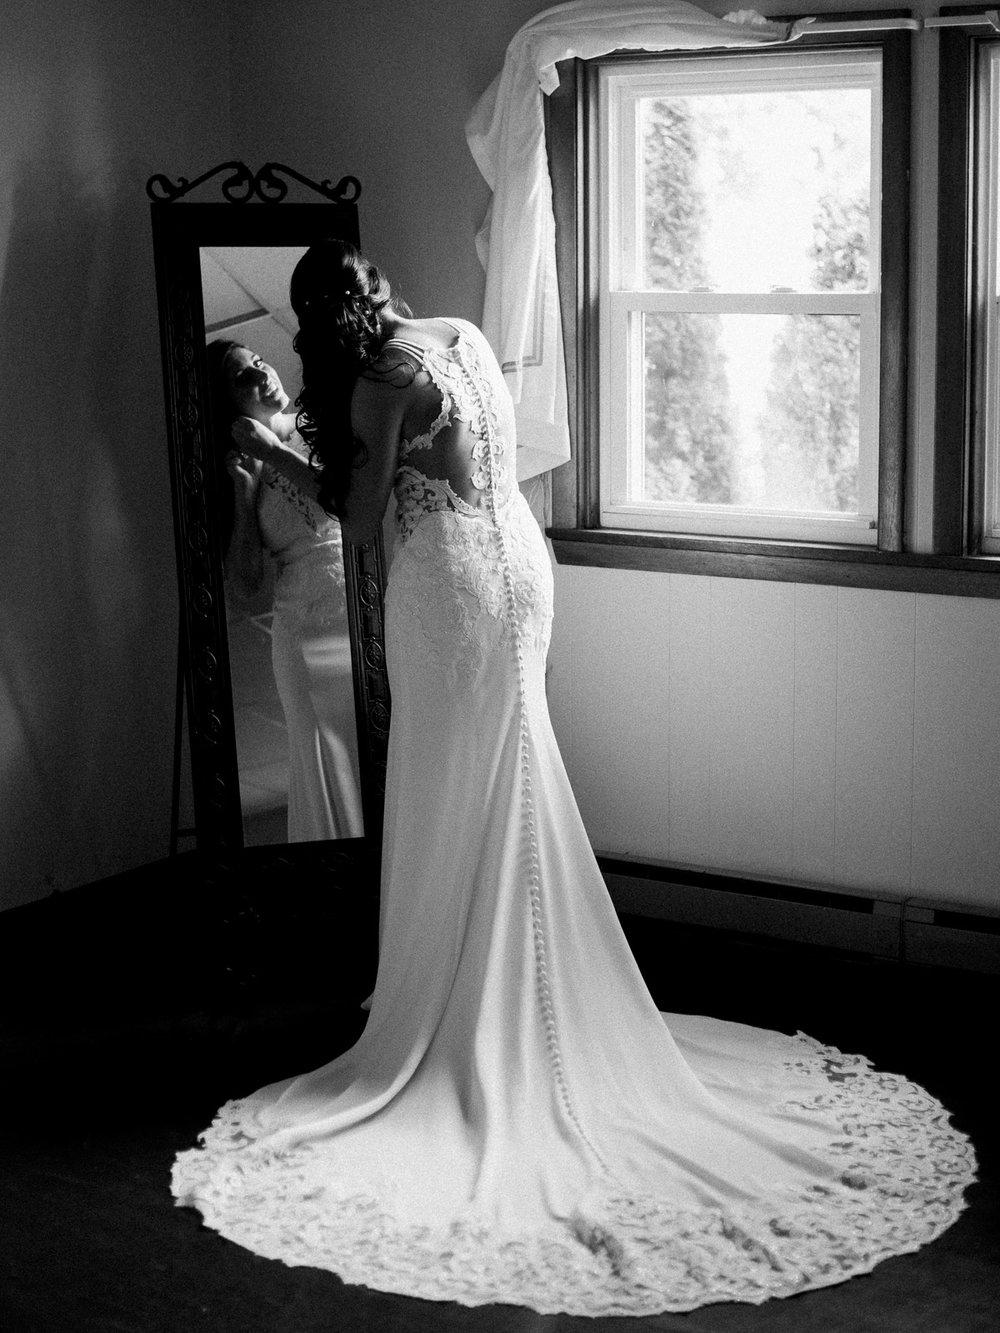 elegant-hoover-hall-wedding-photos-by-matt-erickson-photography-3.jpg